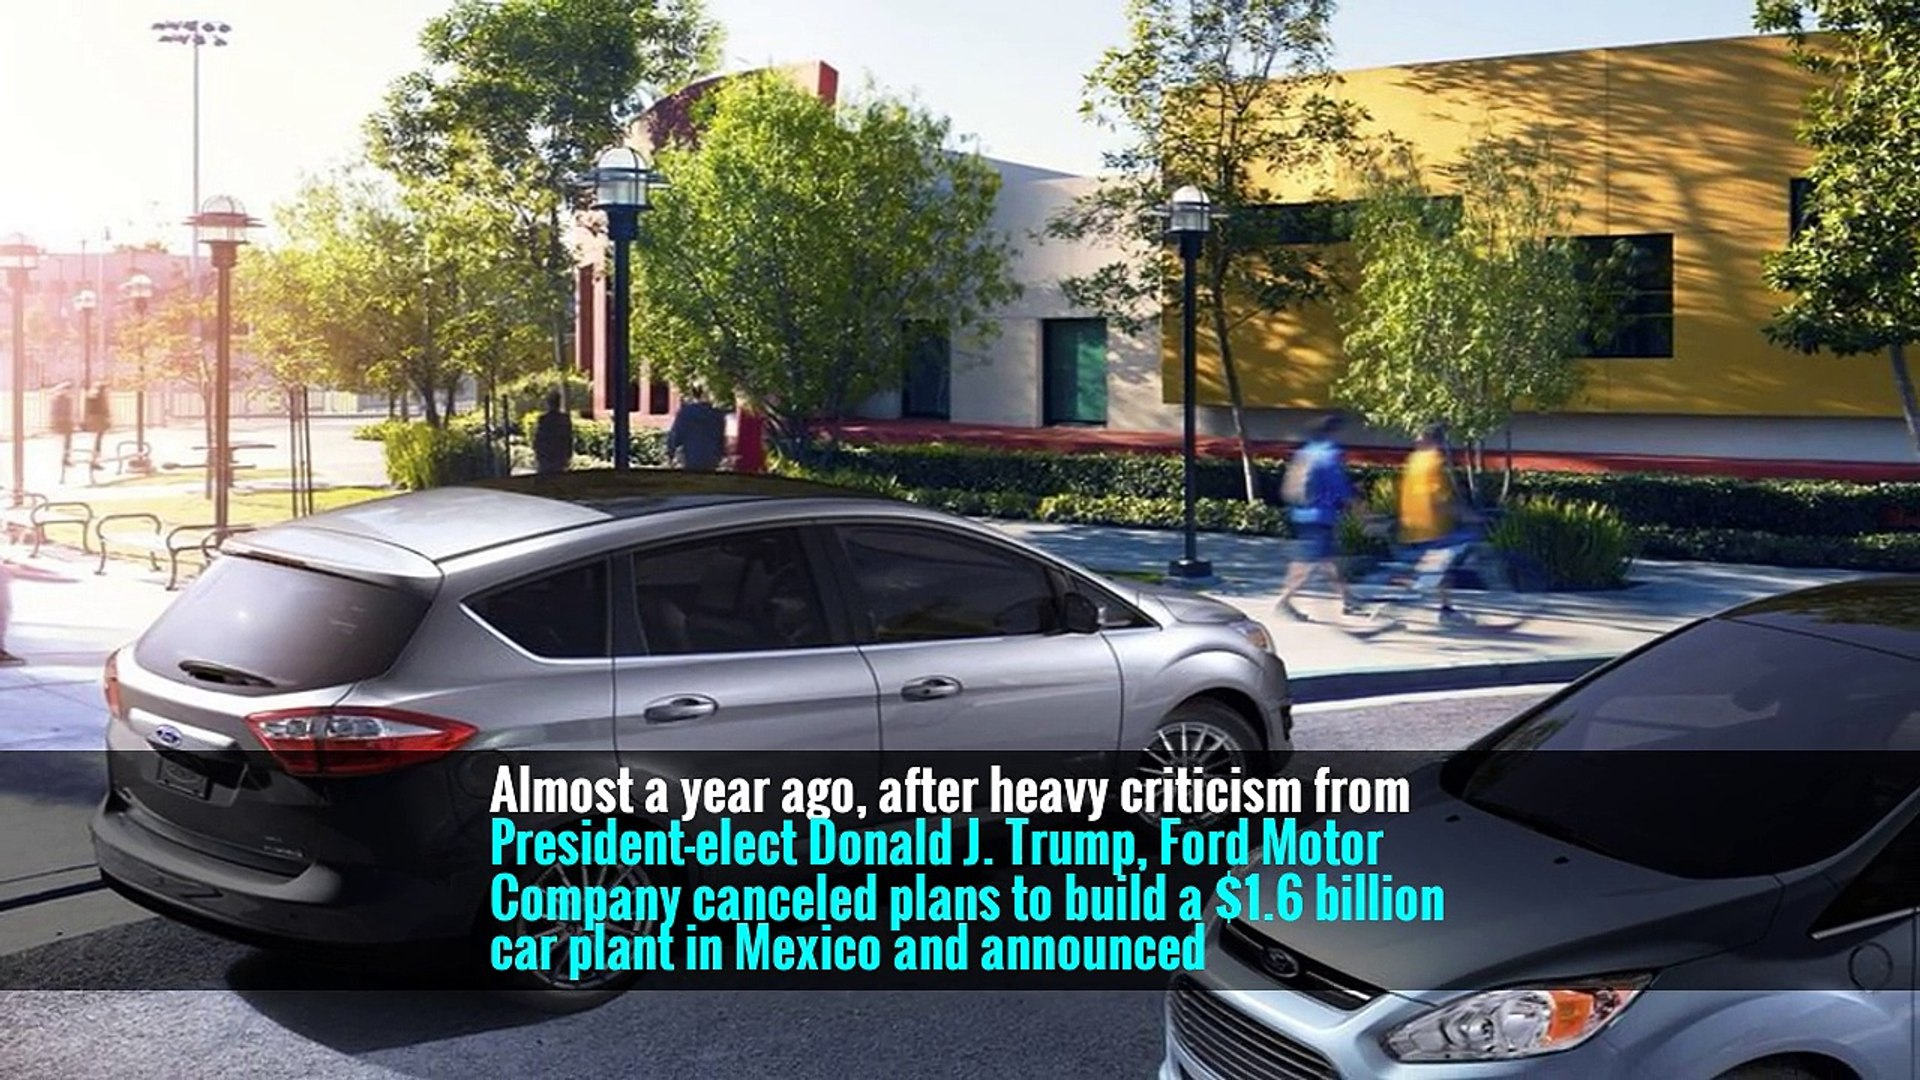 Craigslist Mexico